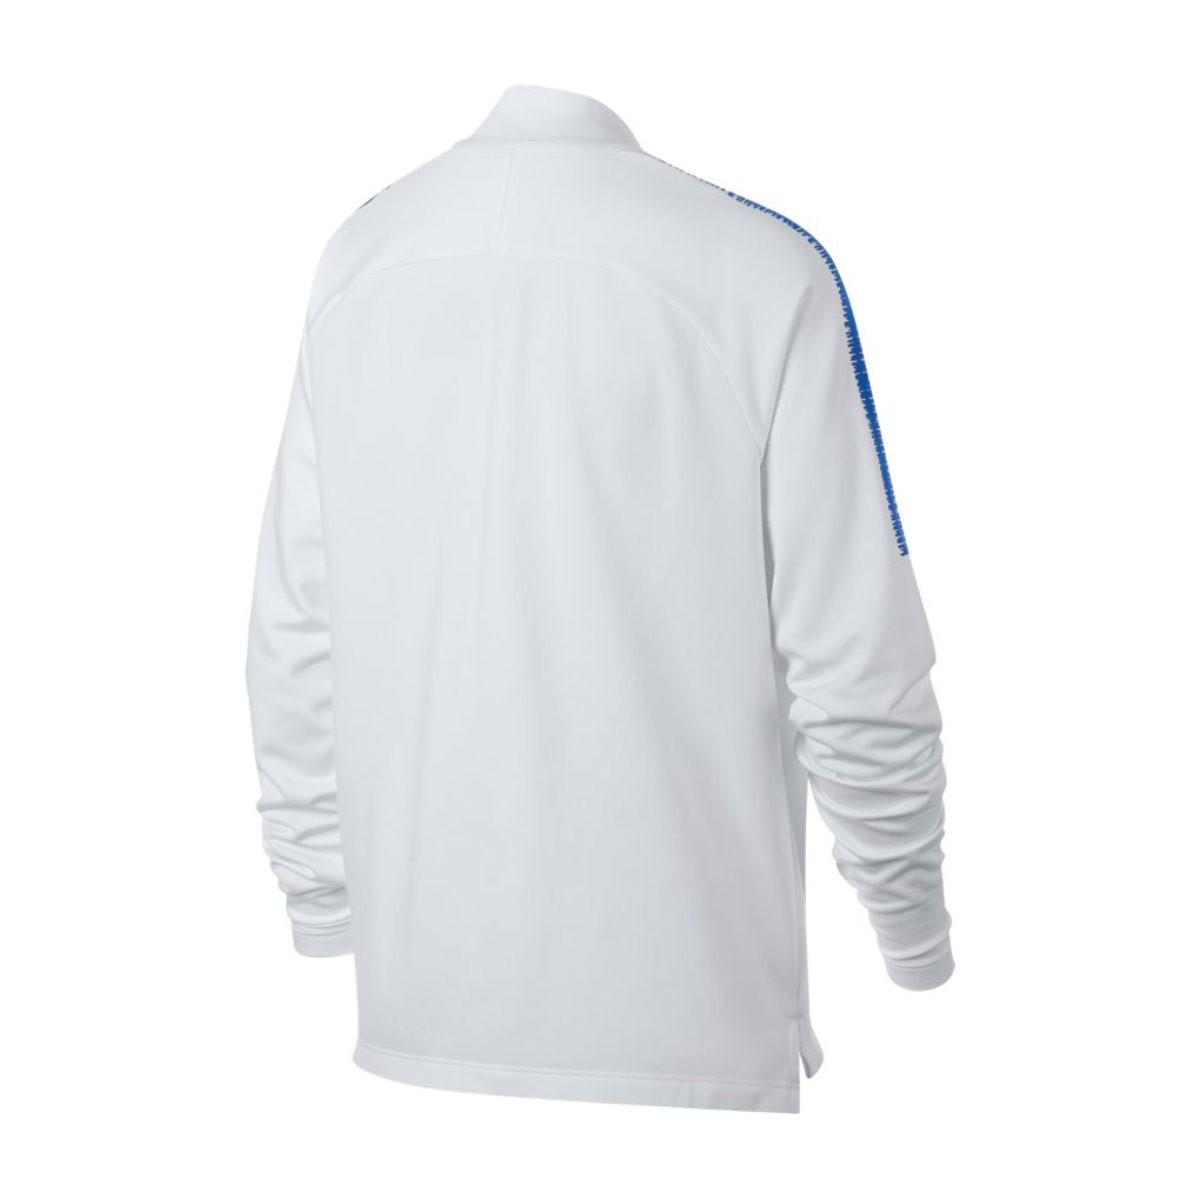 40a921aa39931 Sweatshirt Nike Kids Dry Chelsea FC Squad 2018-2019 White-Rush blue -  Football store Fútbol Emotion